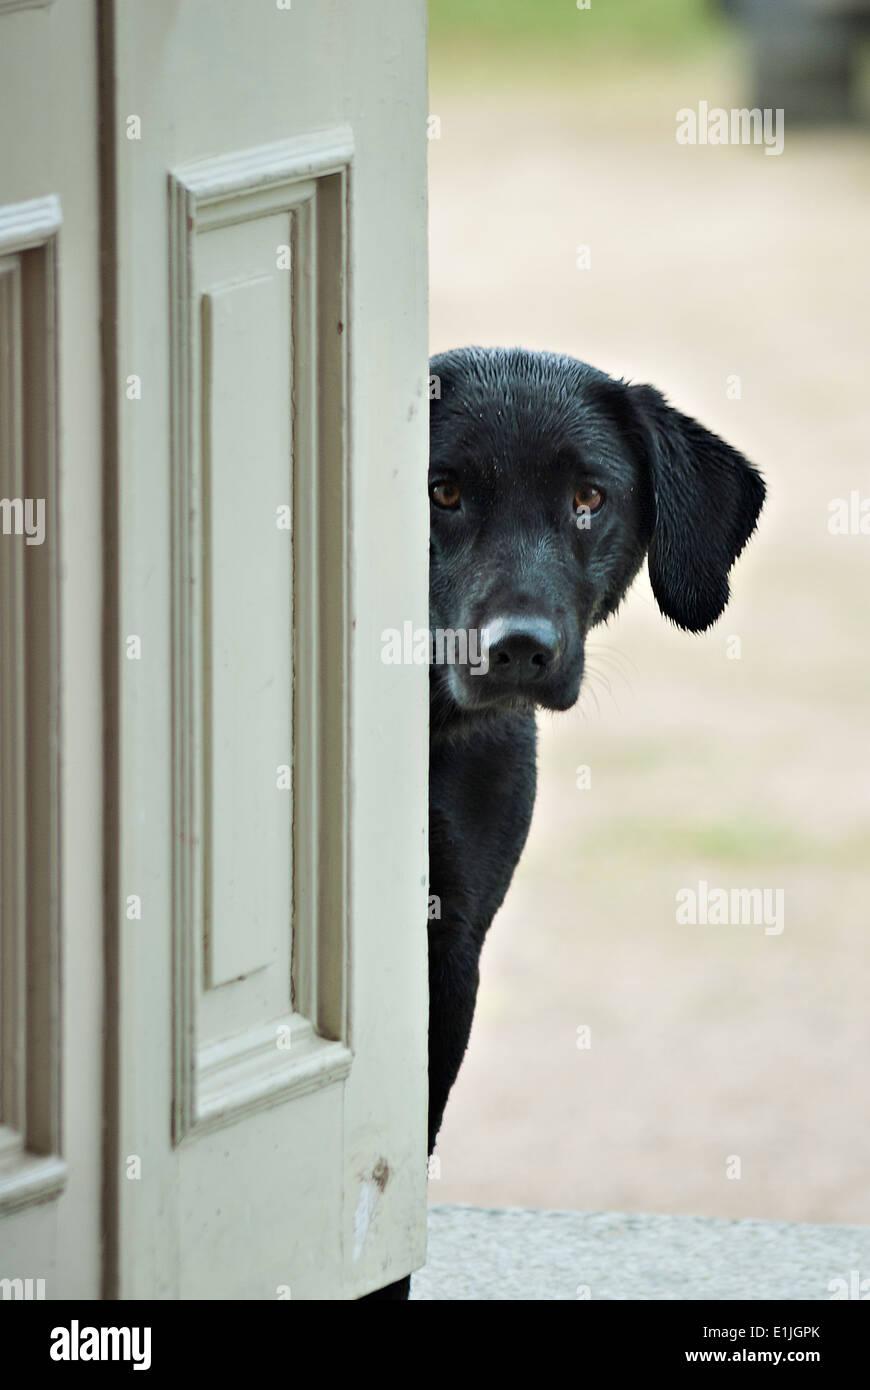 Black crossbred dog hiding behind a door. - Stock Image